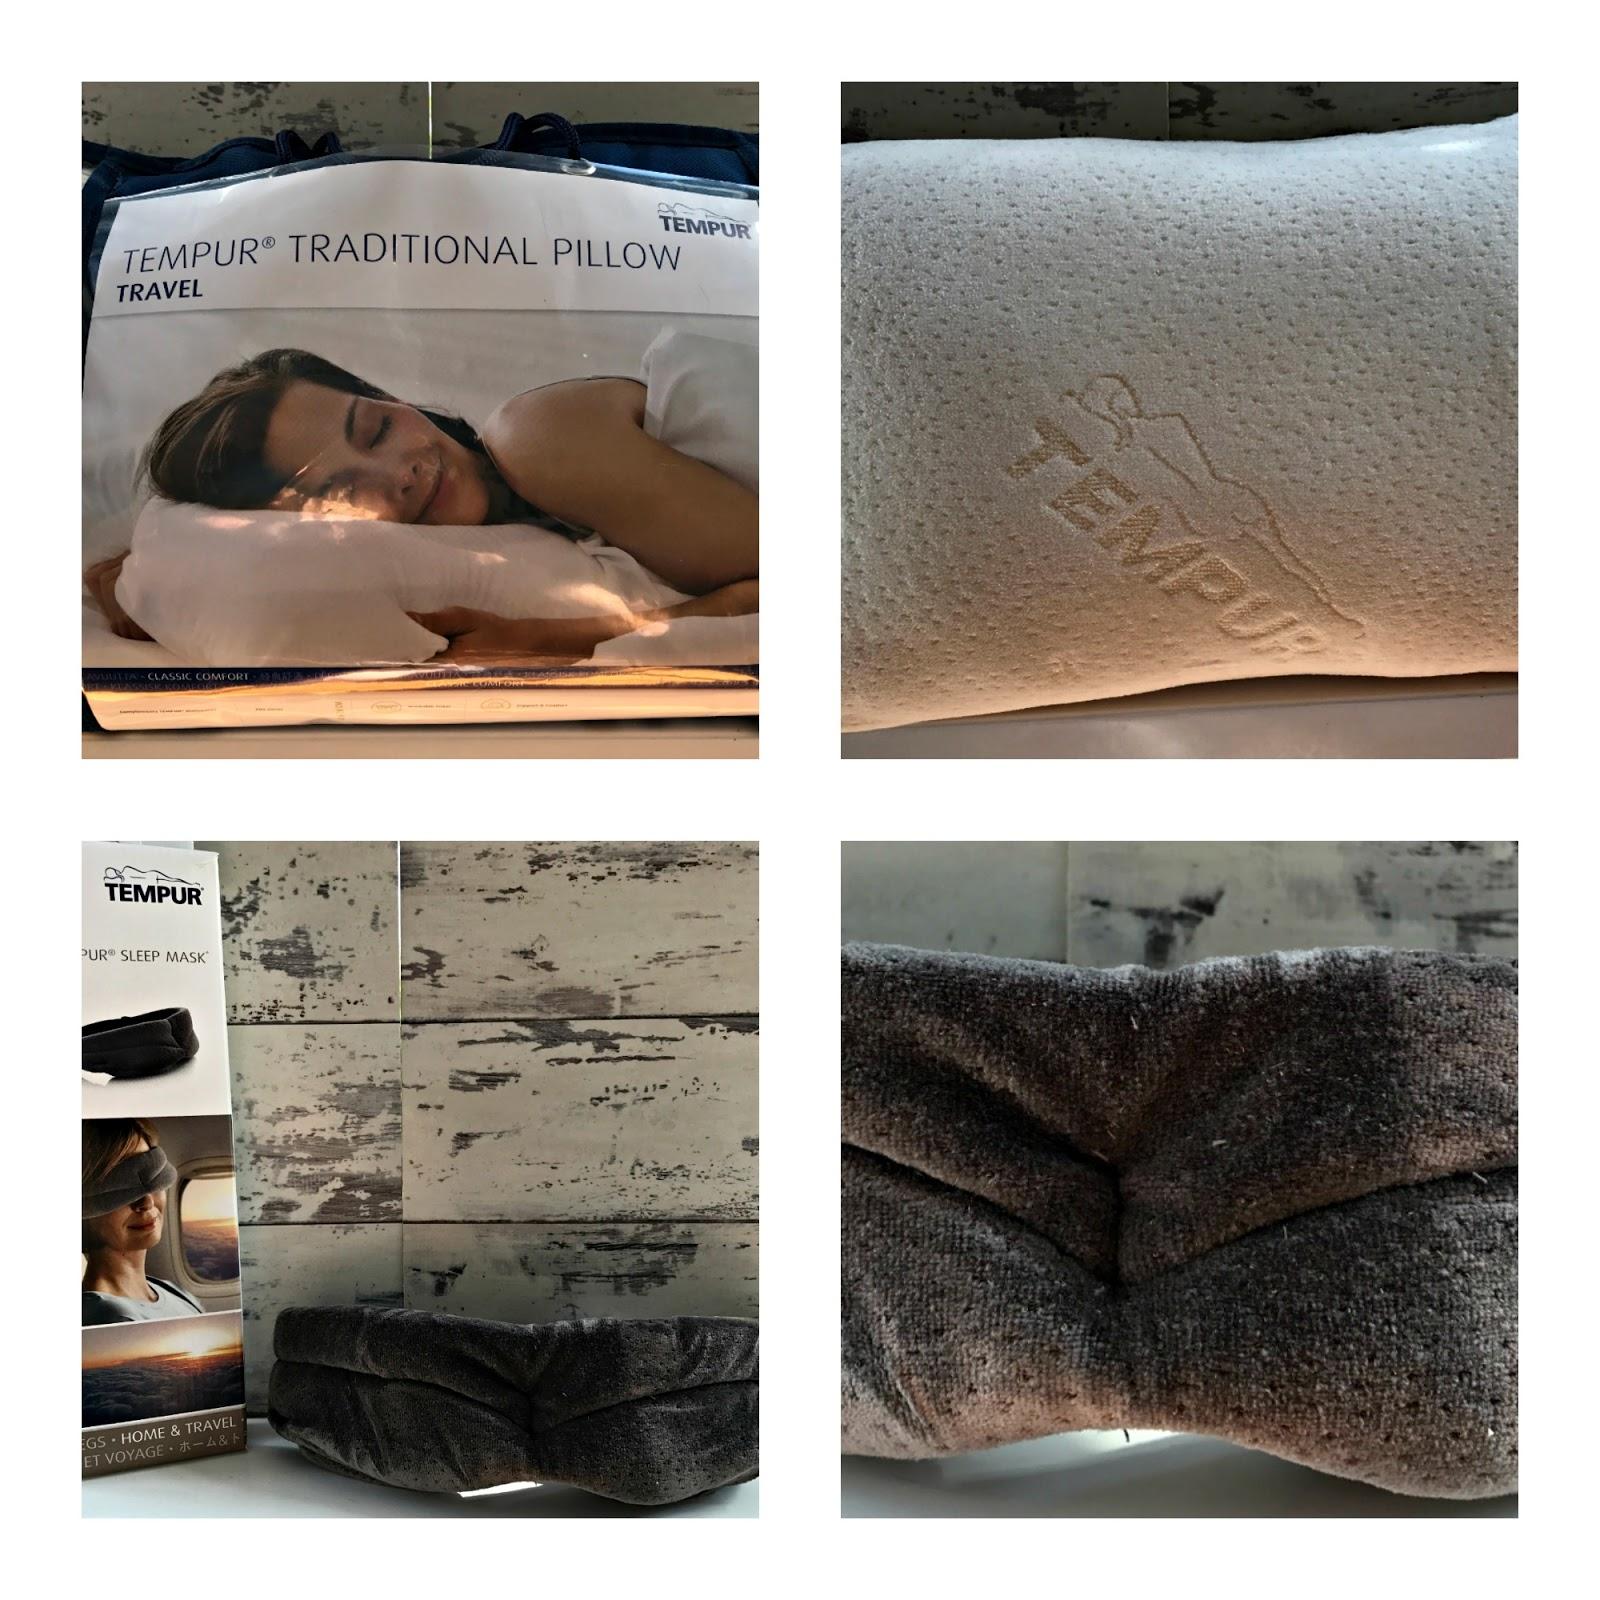 Tempur Comfort Travel Pillow and Sleep Mask